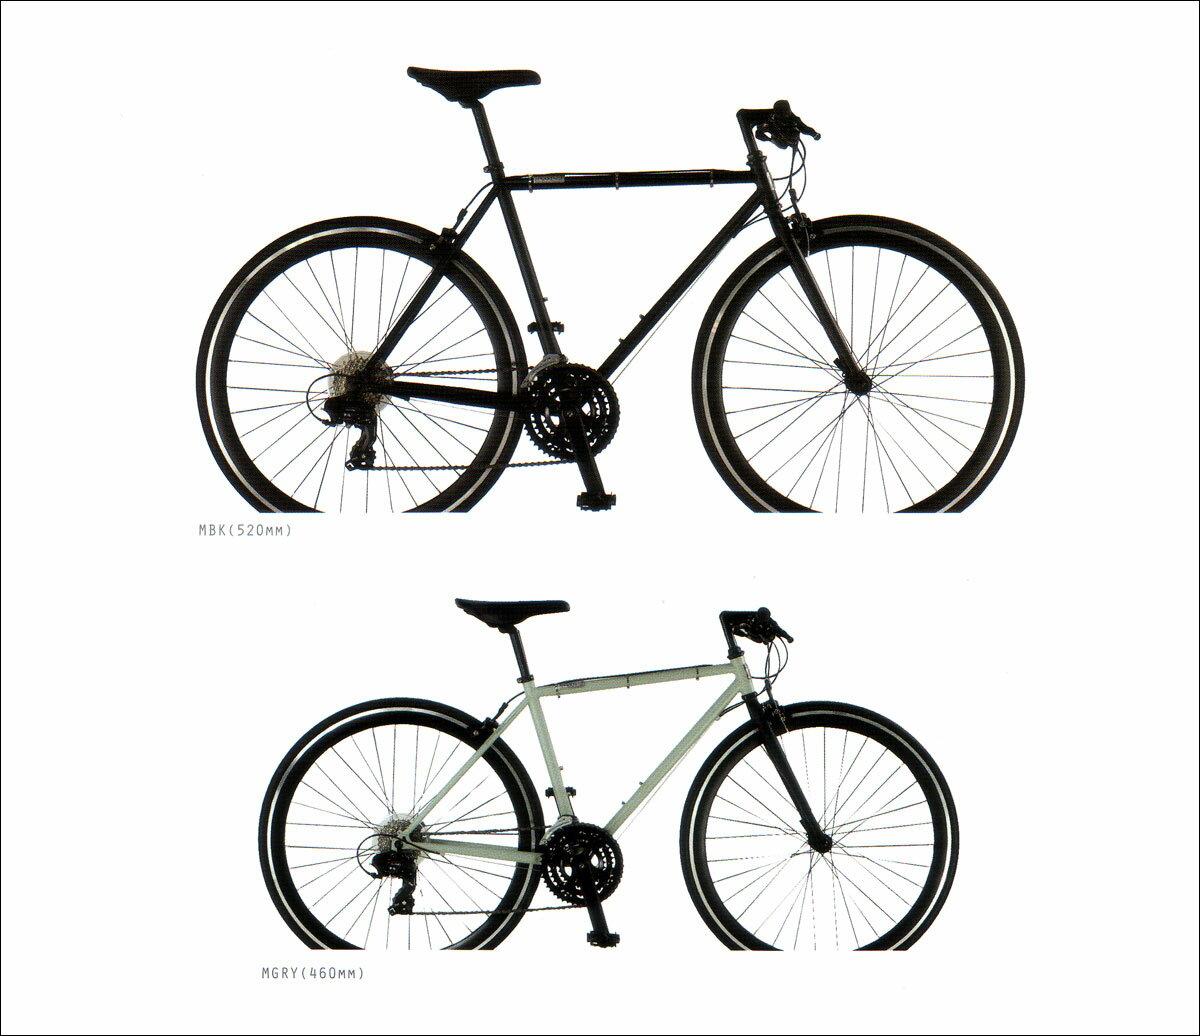 OSSO(オッソ) R330-CR【クロスバイク】【運動/健康/美容】 OSSO(オッソ) R330-CR【クロスバイク】